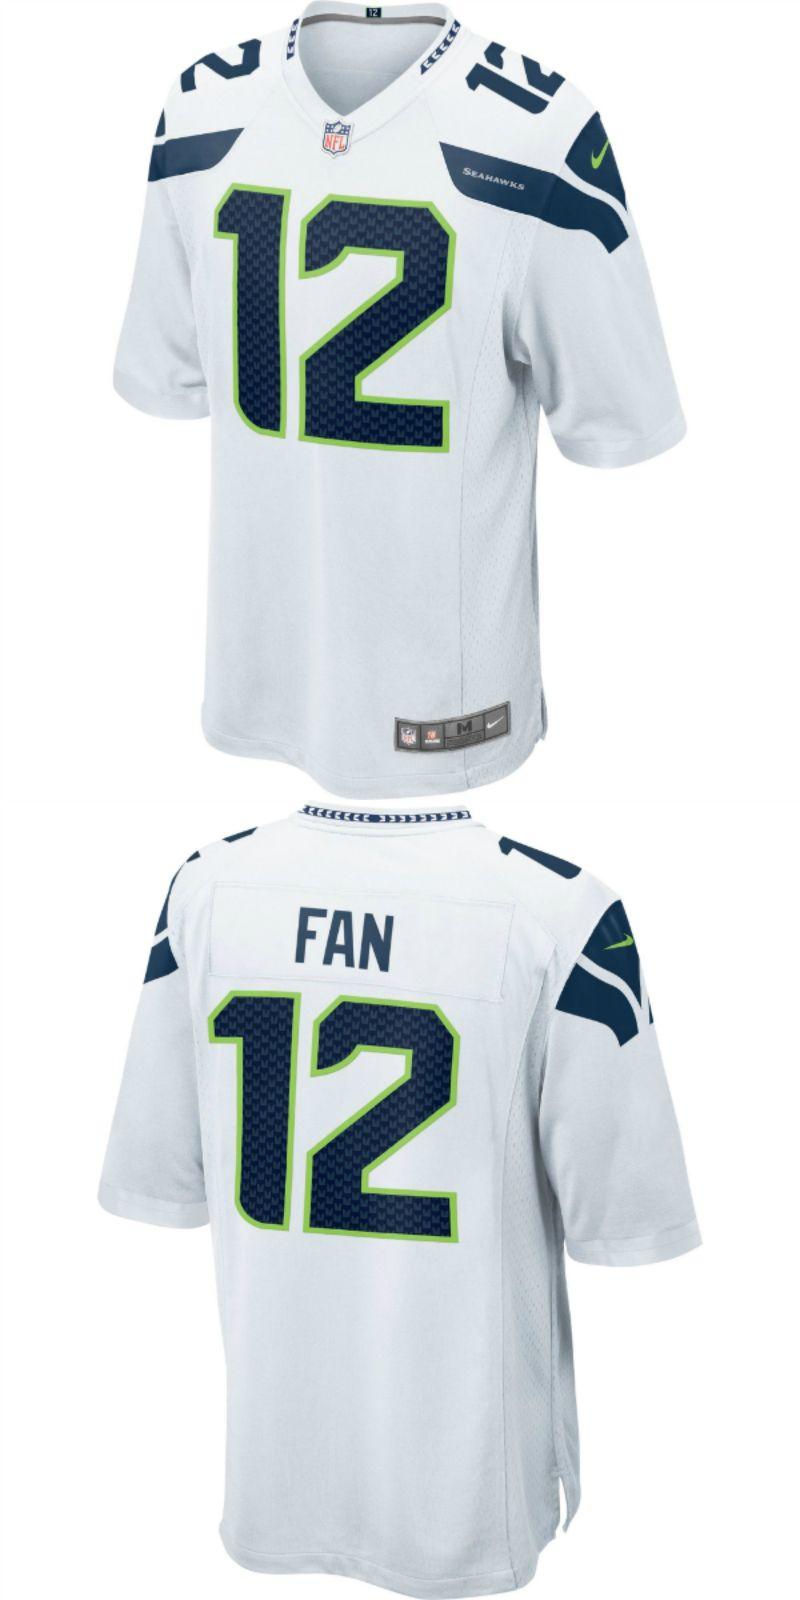 Up To 70 Off Fan 12 Seattle Seahawks Nike Alternate Game Jersey White Seattle Seah Seattle Seahawks Football Players Atlanta Falcons T Shirt Seahawks Jersey